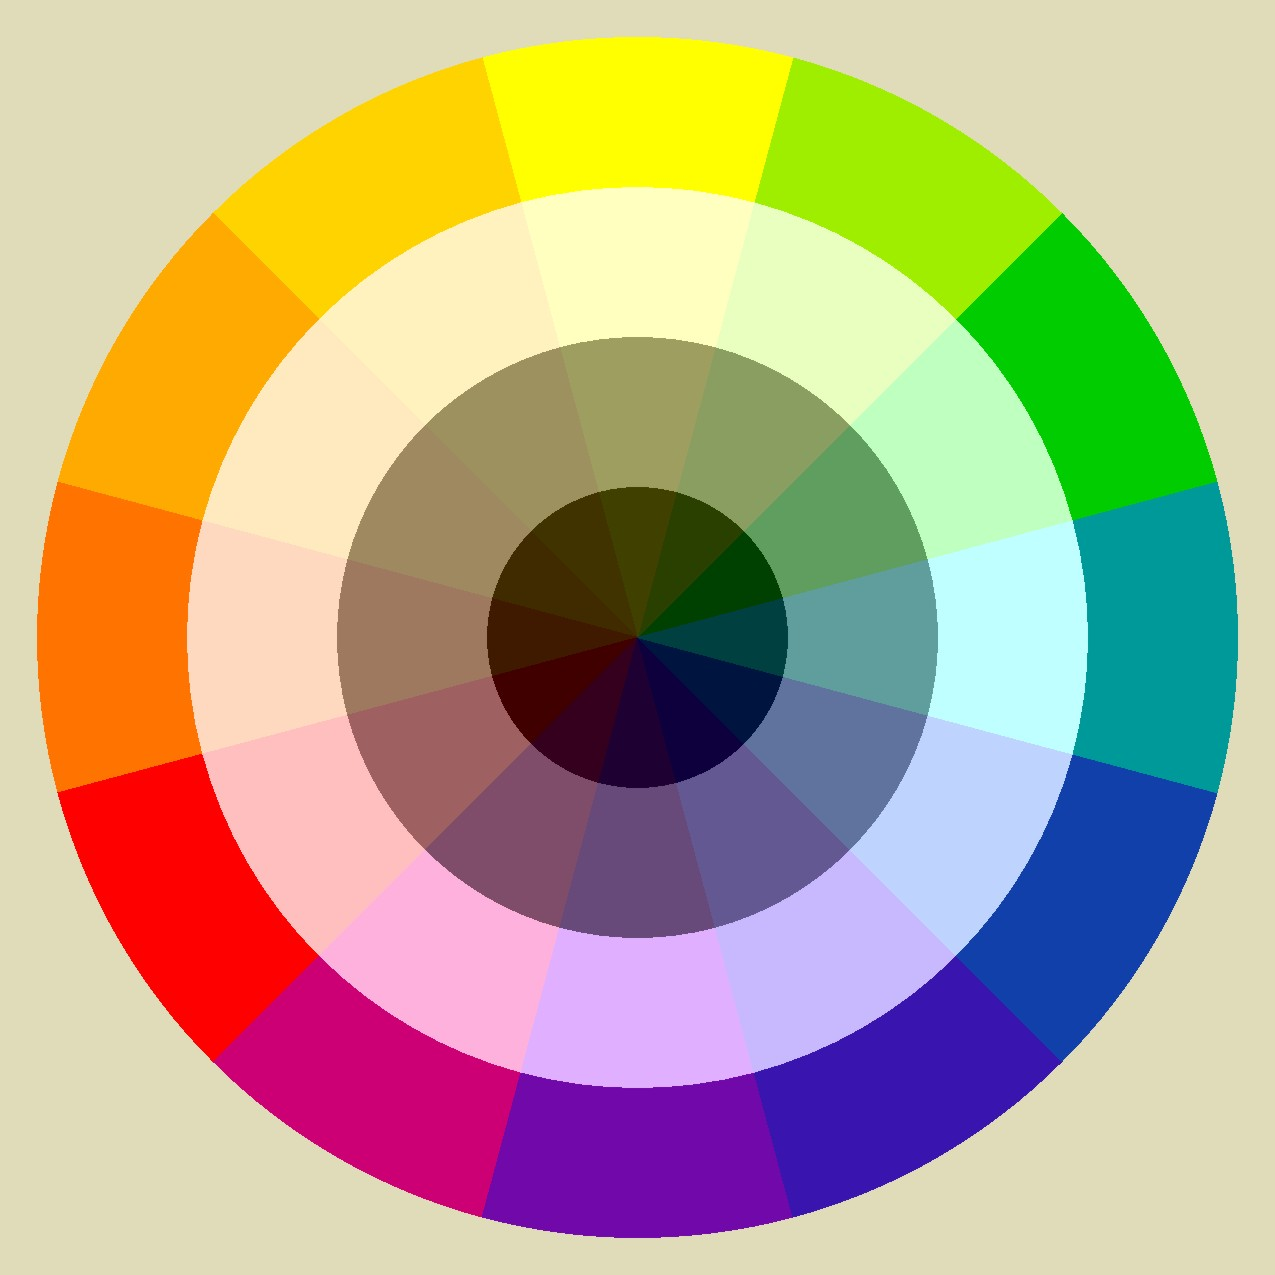 Monochromatic Color Scheme Kathy K Wylie Quilts